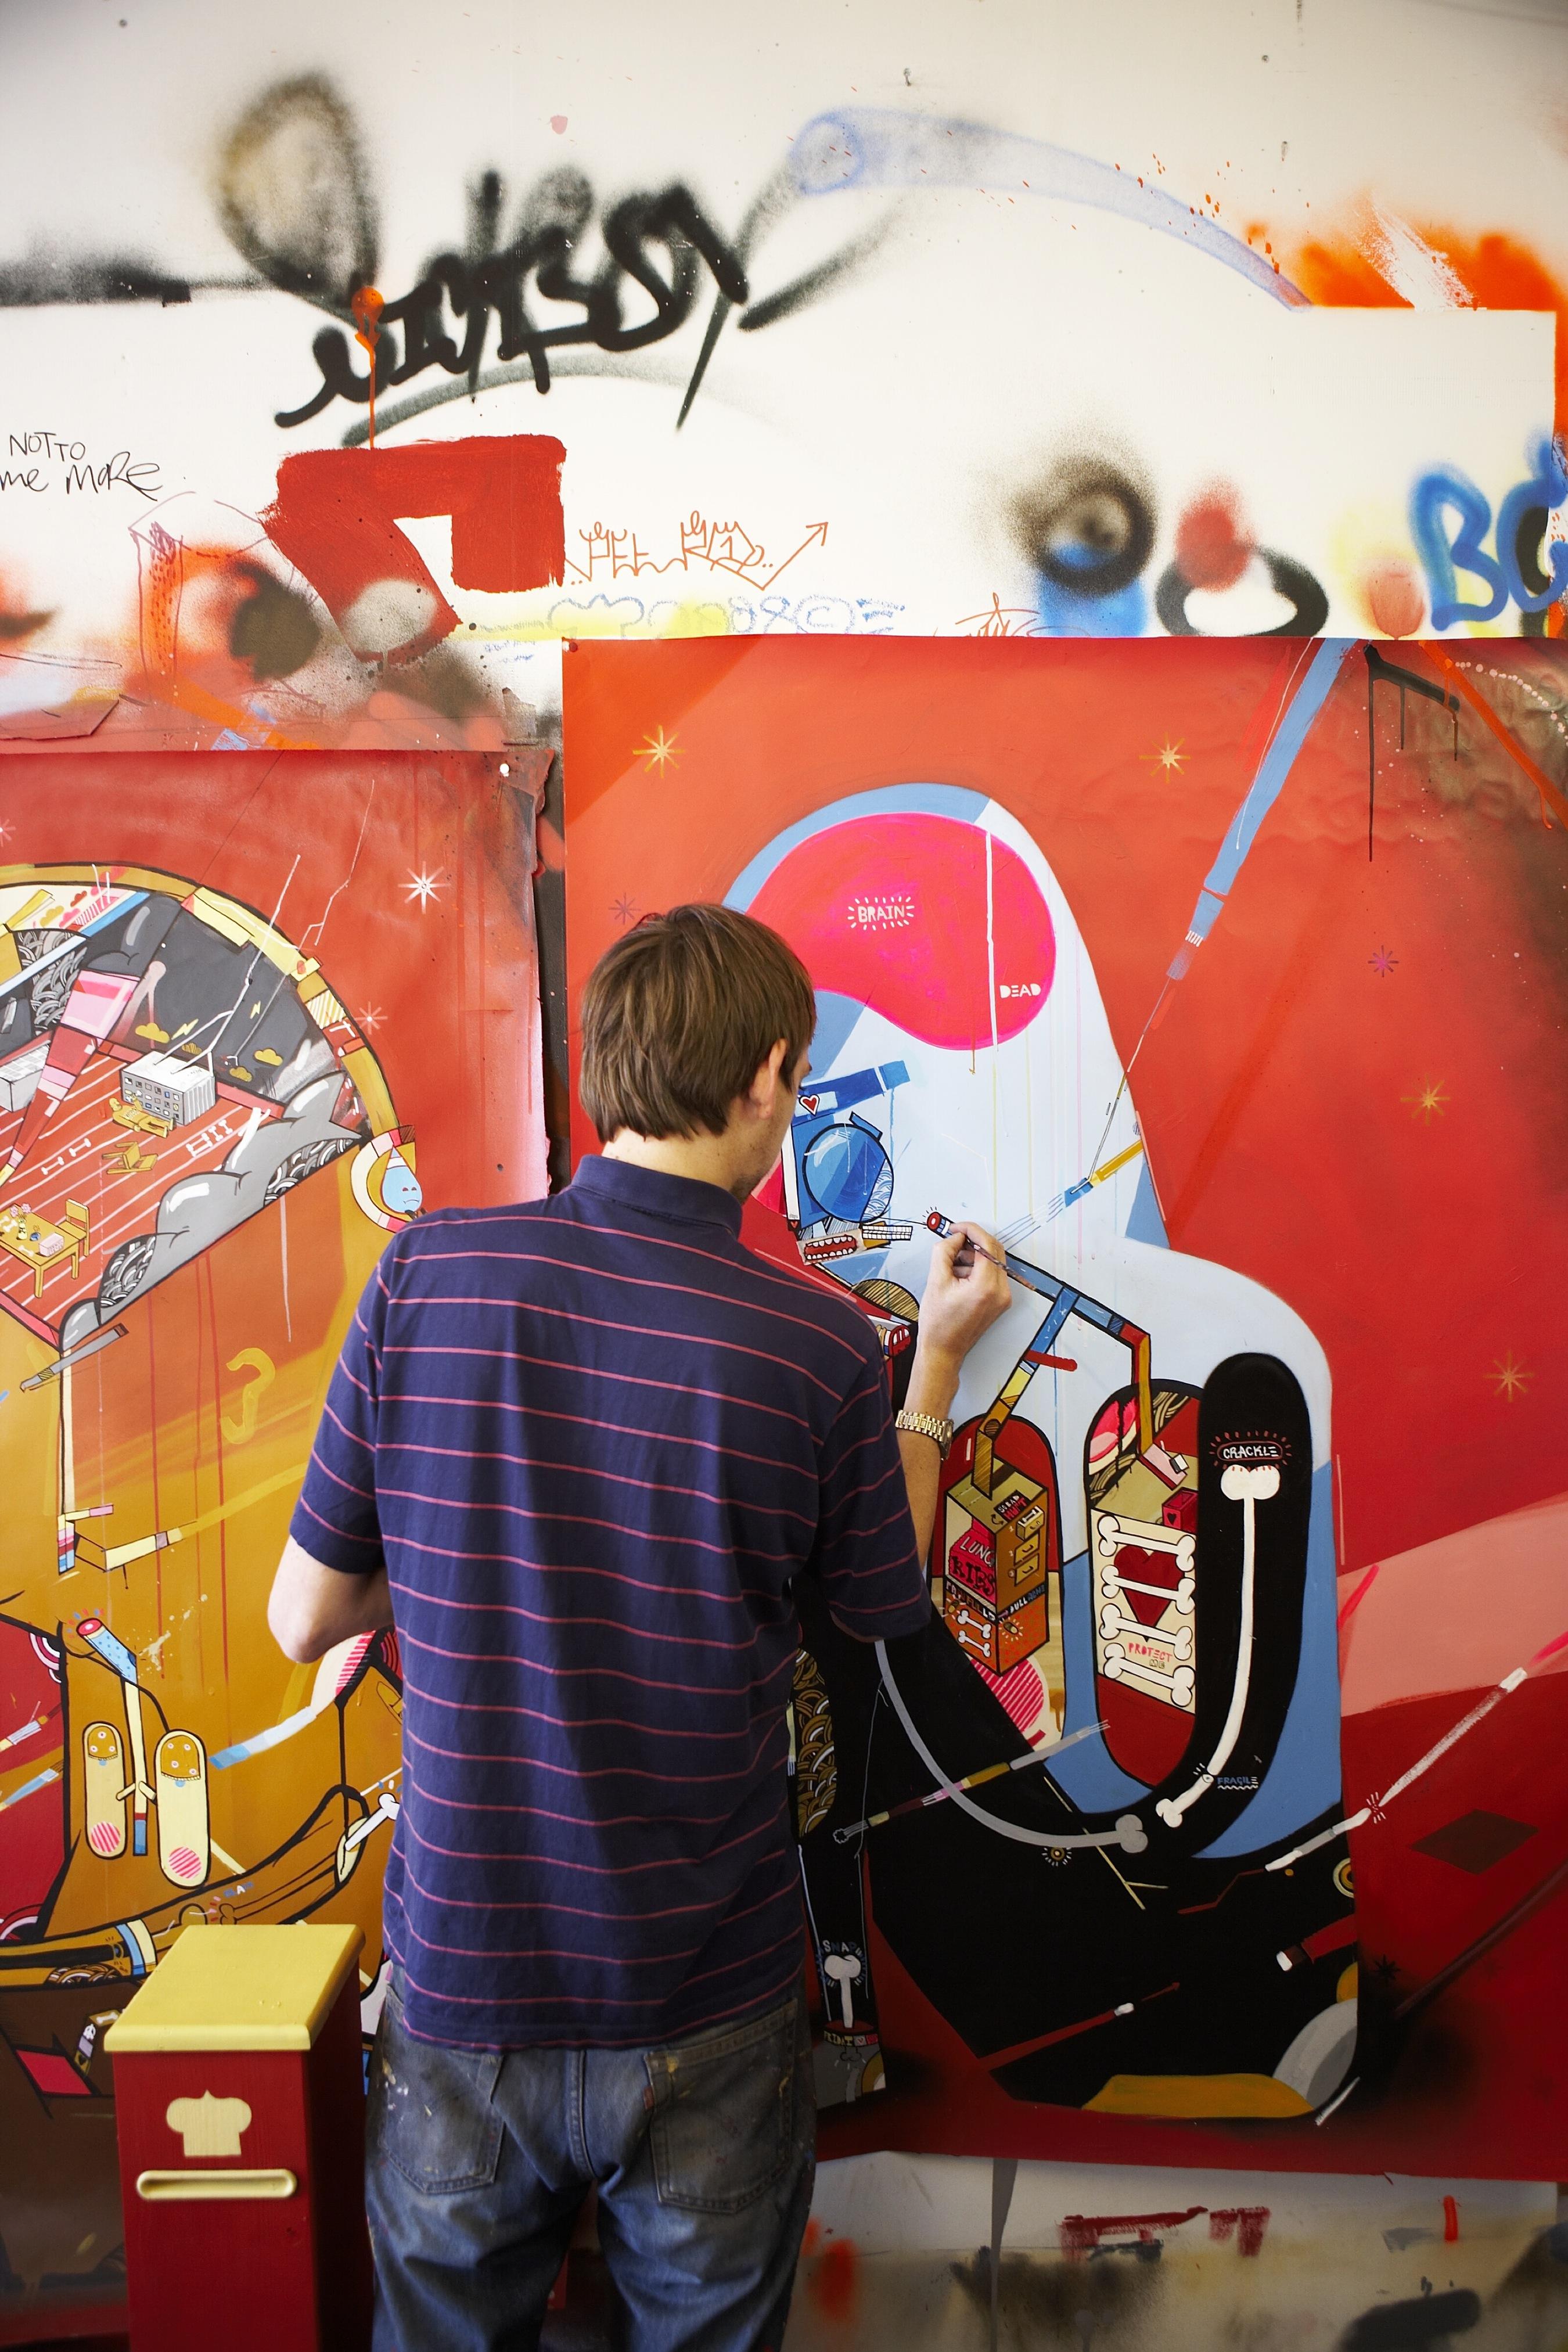 Photography by www.andrepenteado.com